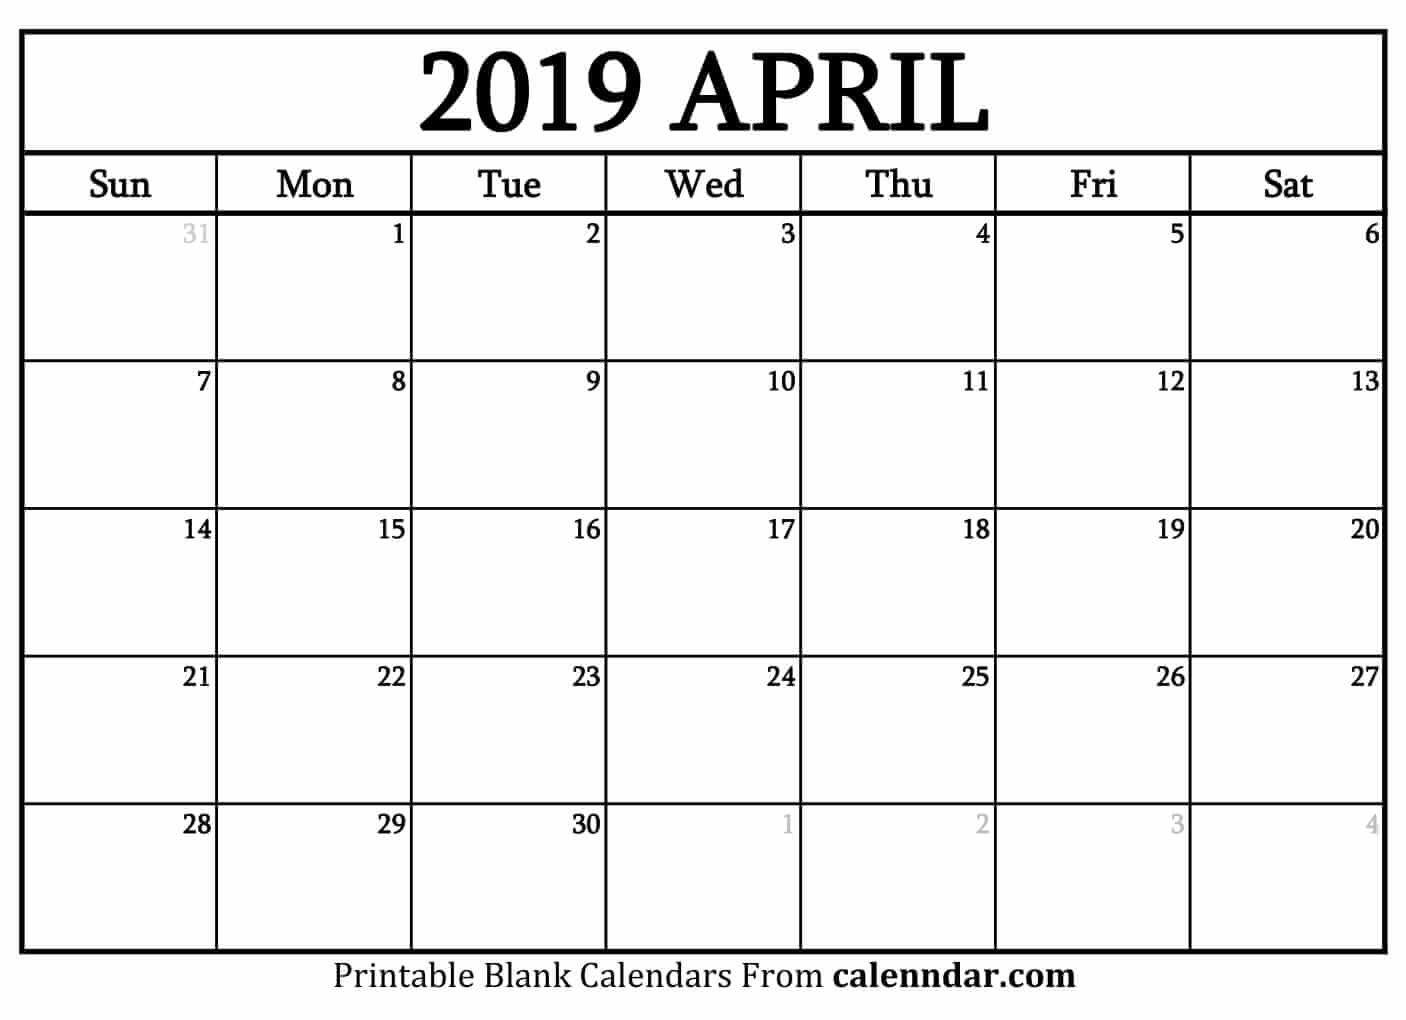 Blank April 2019 Printable Calendar - Printable Calendar 2019| Blank Calendar 2019 April Printable